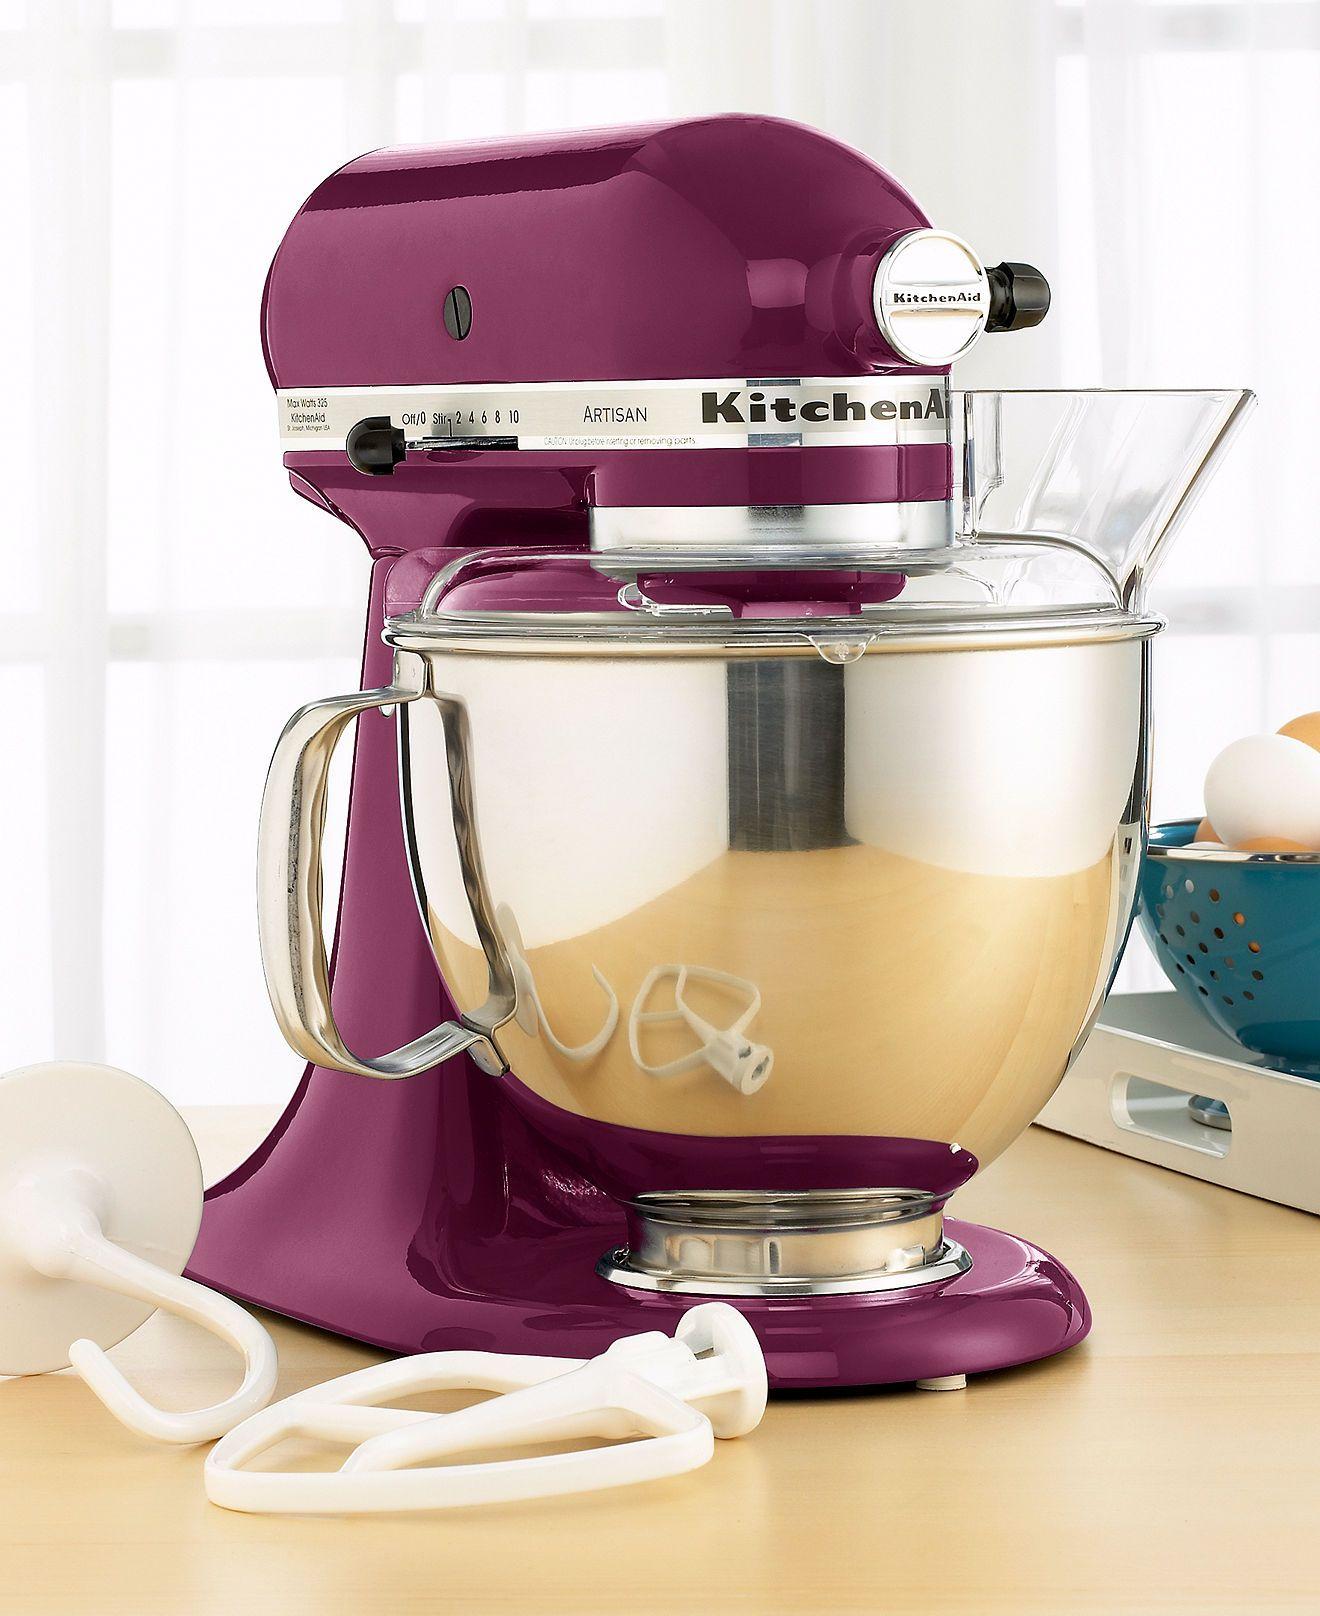 Artisan 5 qt stand mixer ksm150ps kitchen aid